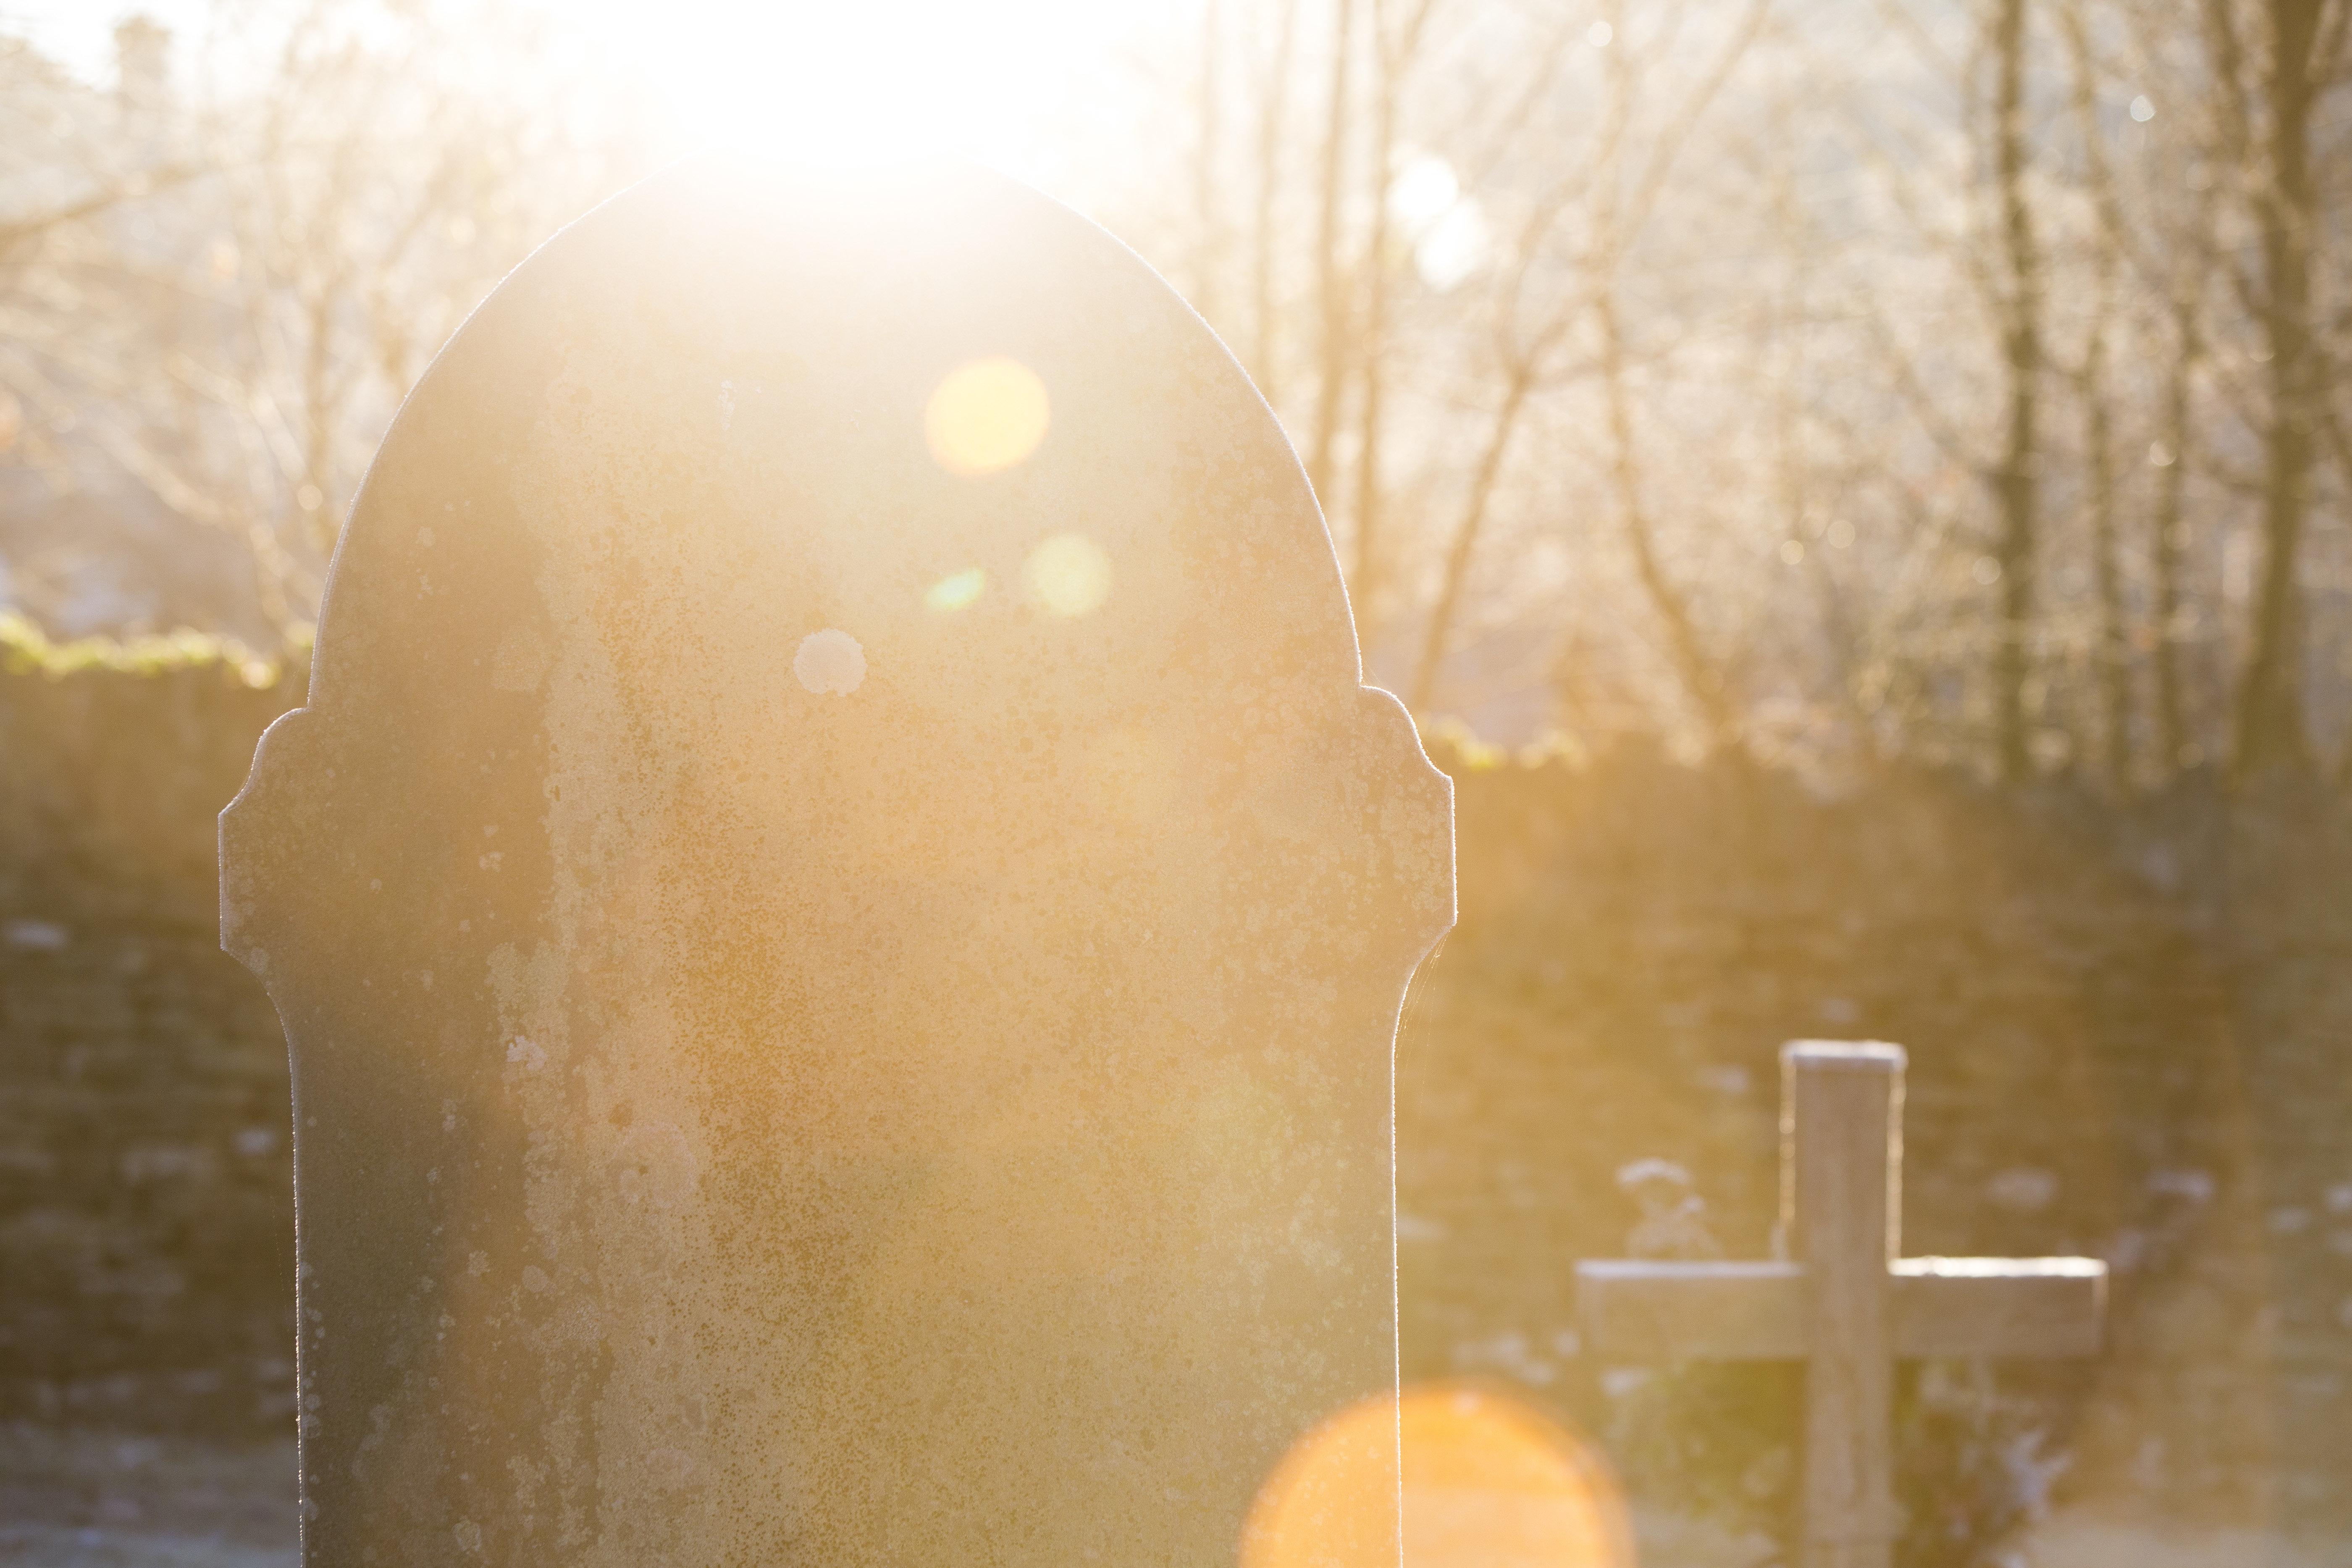 Türkei: Mysteriöses Mädchen auf Friedhof versetzt Stadt in Panik